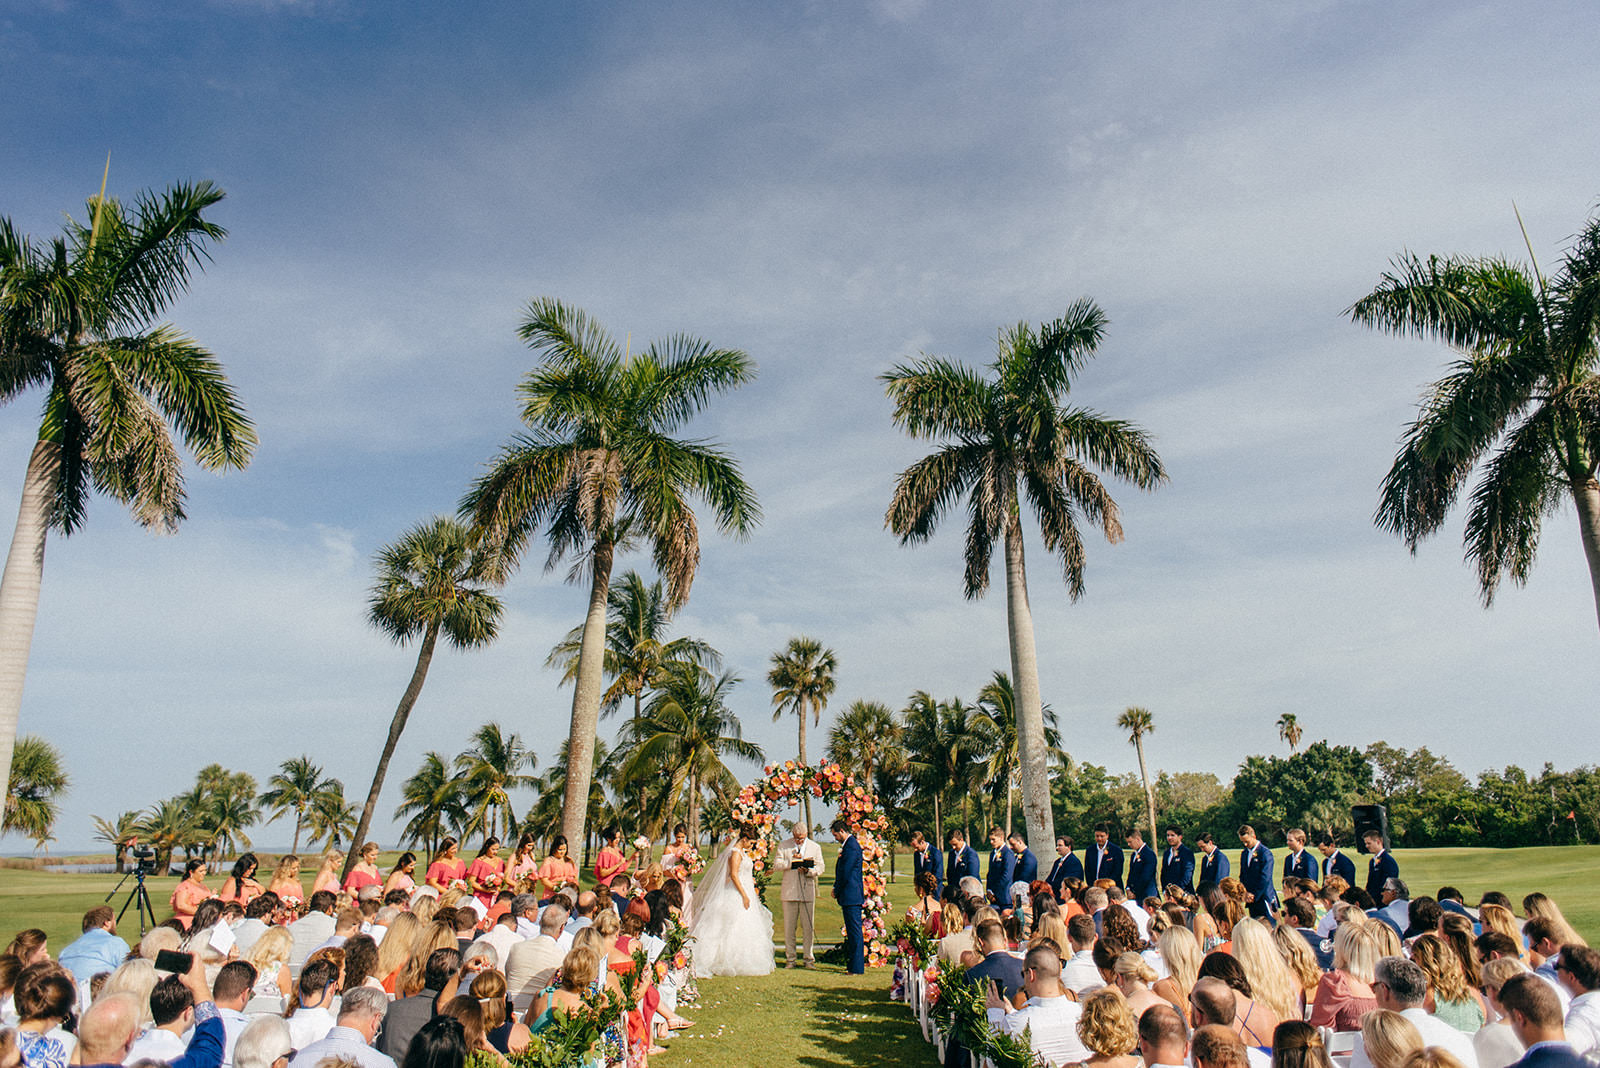 Tropical Wedding Ceremony Decor, Colorful Pink and Coral Floral Arch, Bride and Groom Exchanging Vows   Boca Grande Wedding Venue Gasparilla Inn   Tampa Bay Wedding Planner NK Weddings